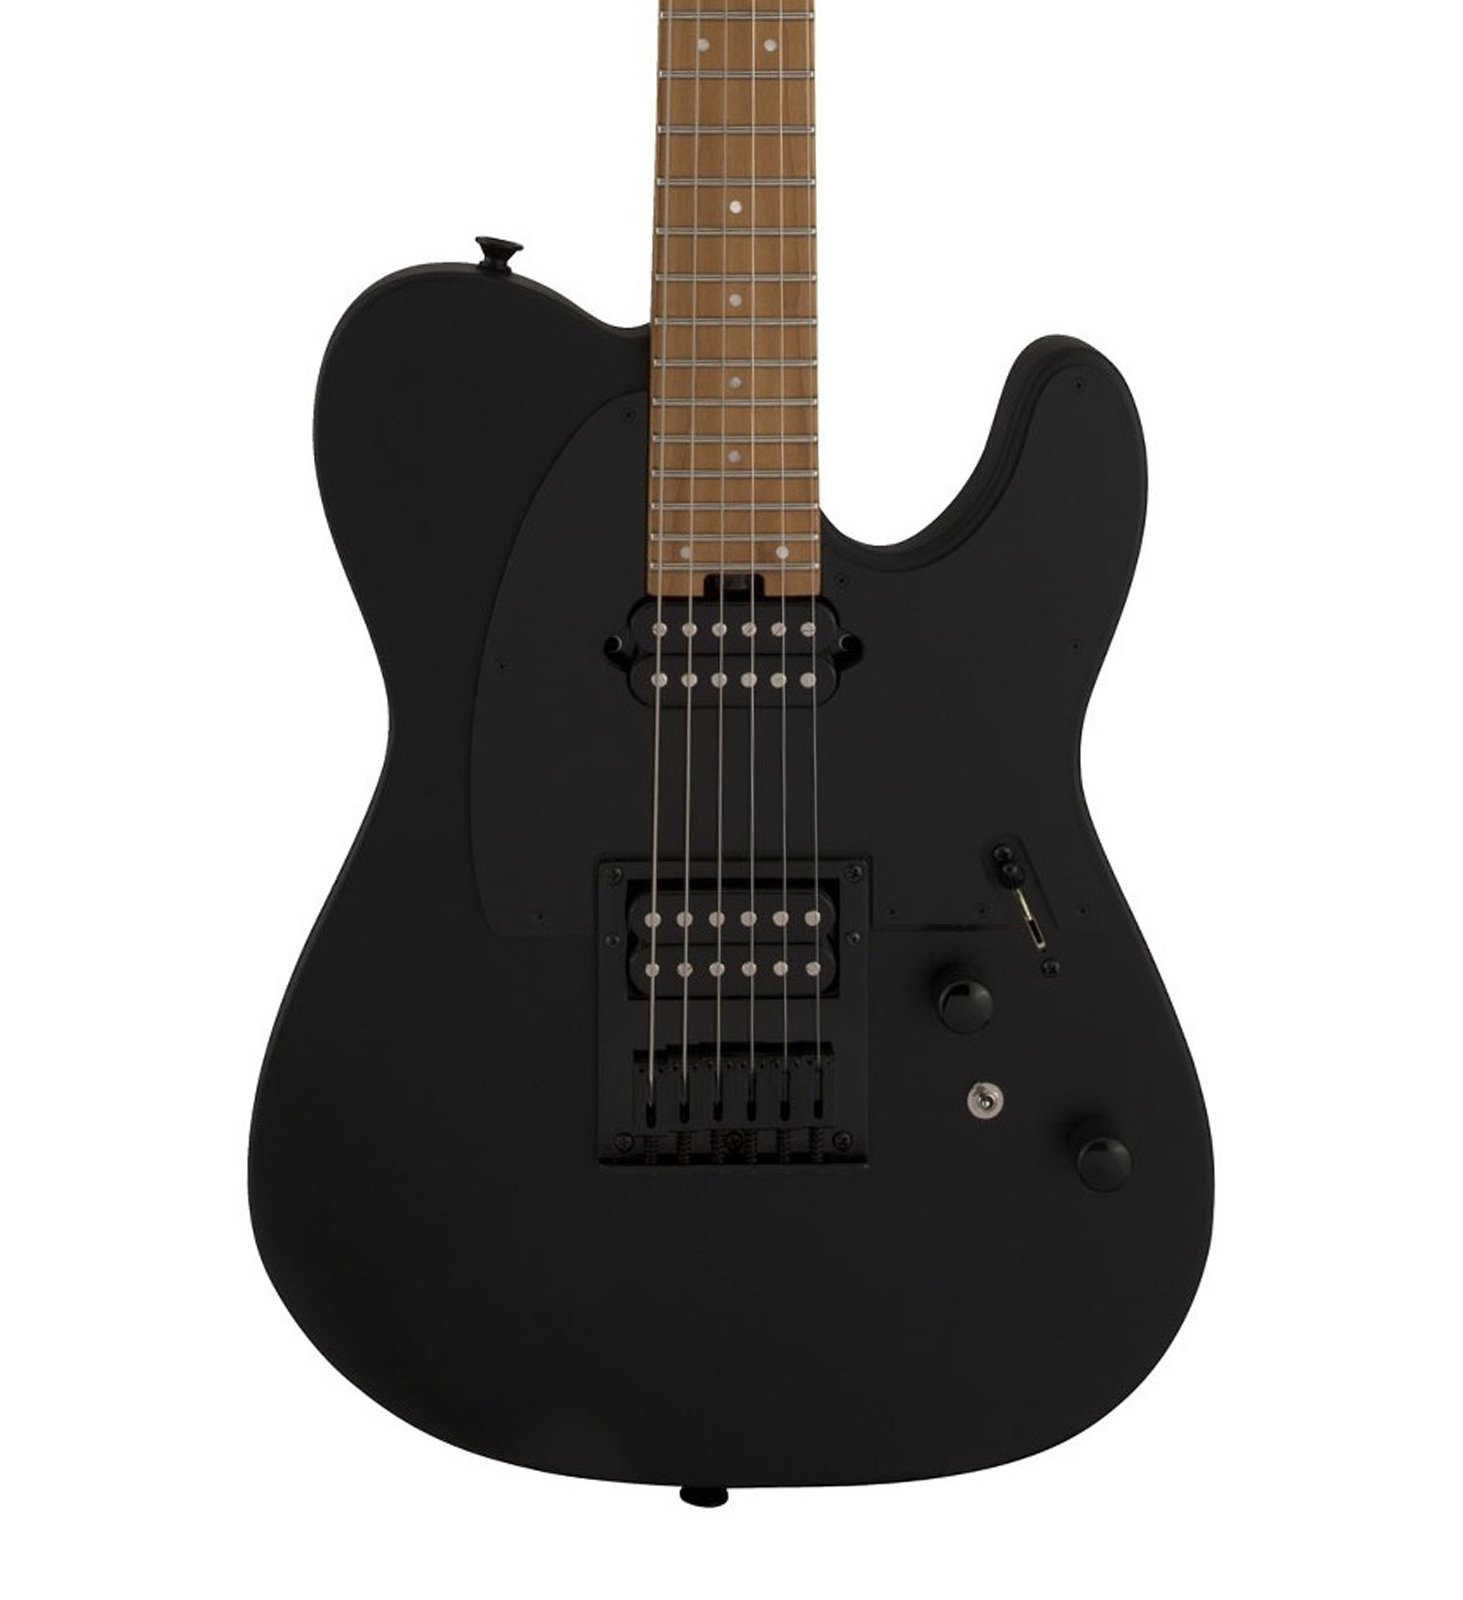 Charvel Pro Mod So-Cal Style 2 24 HT HH - Satin Black